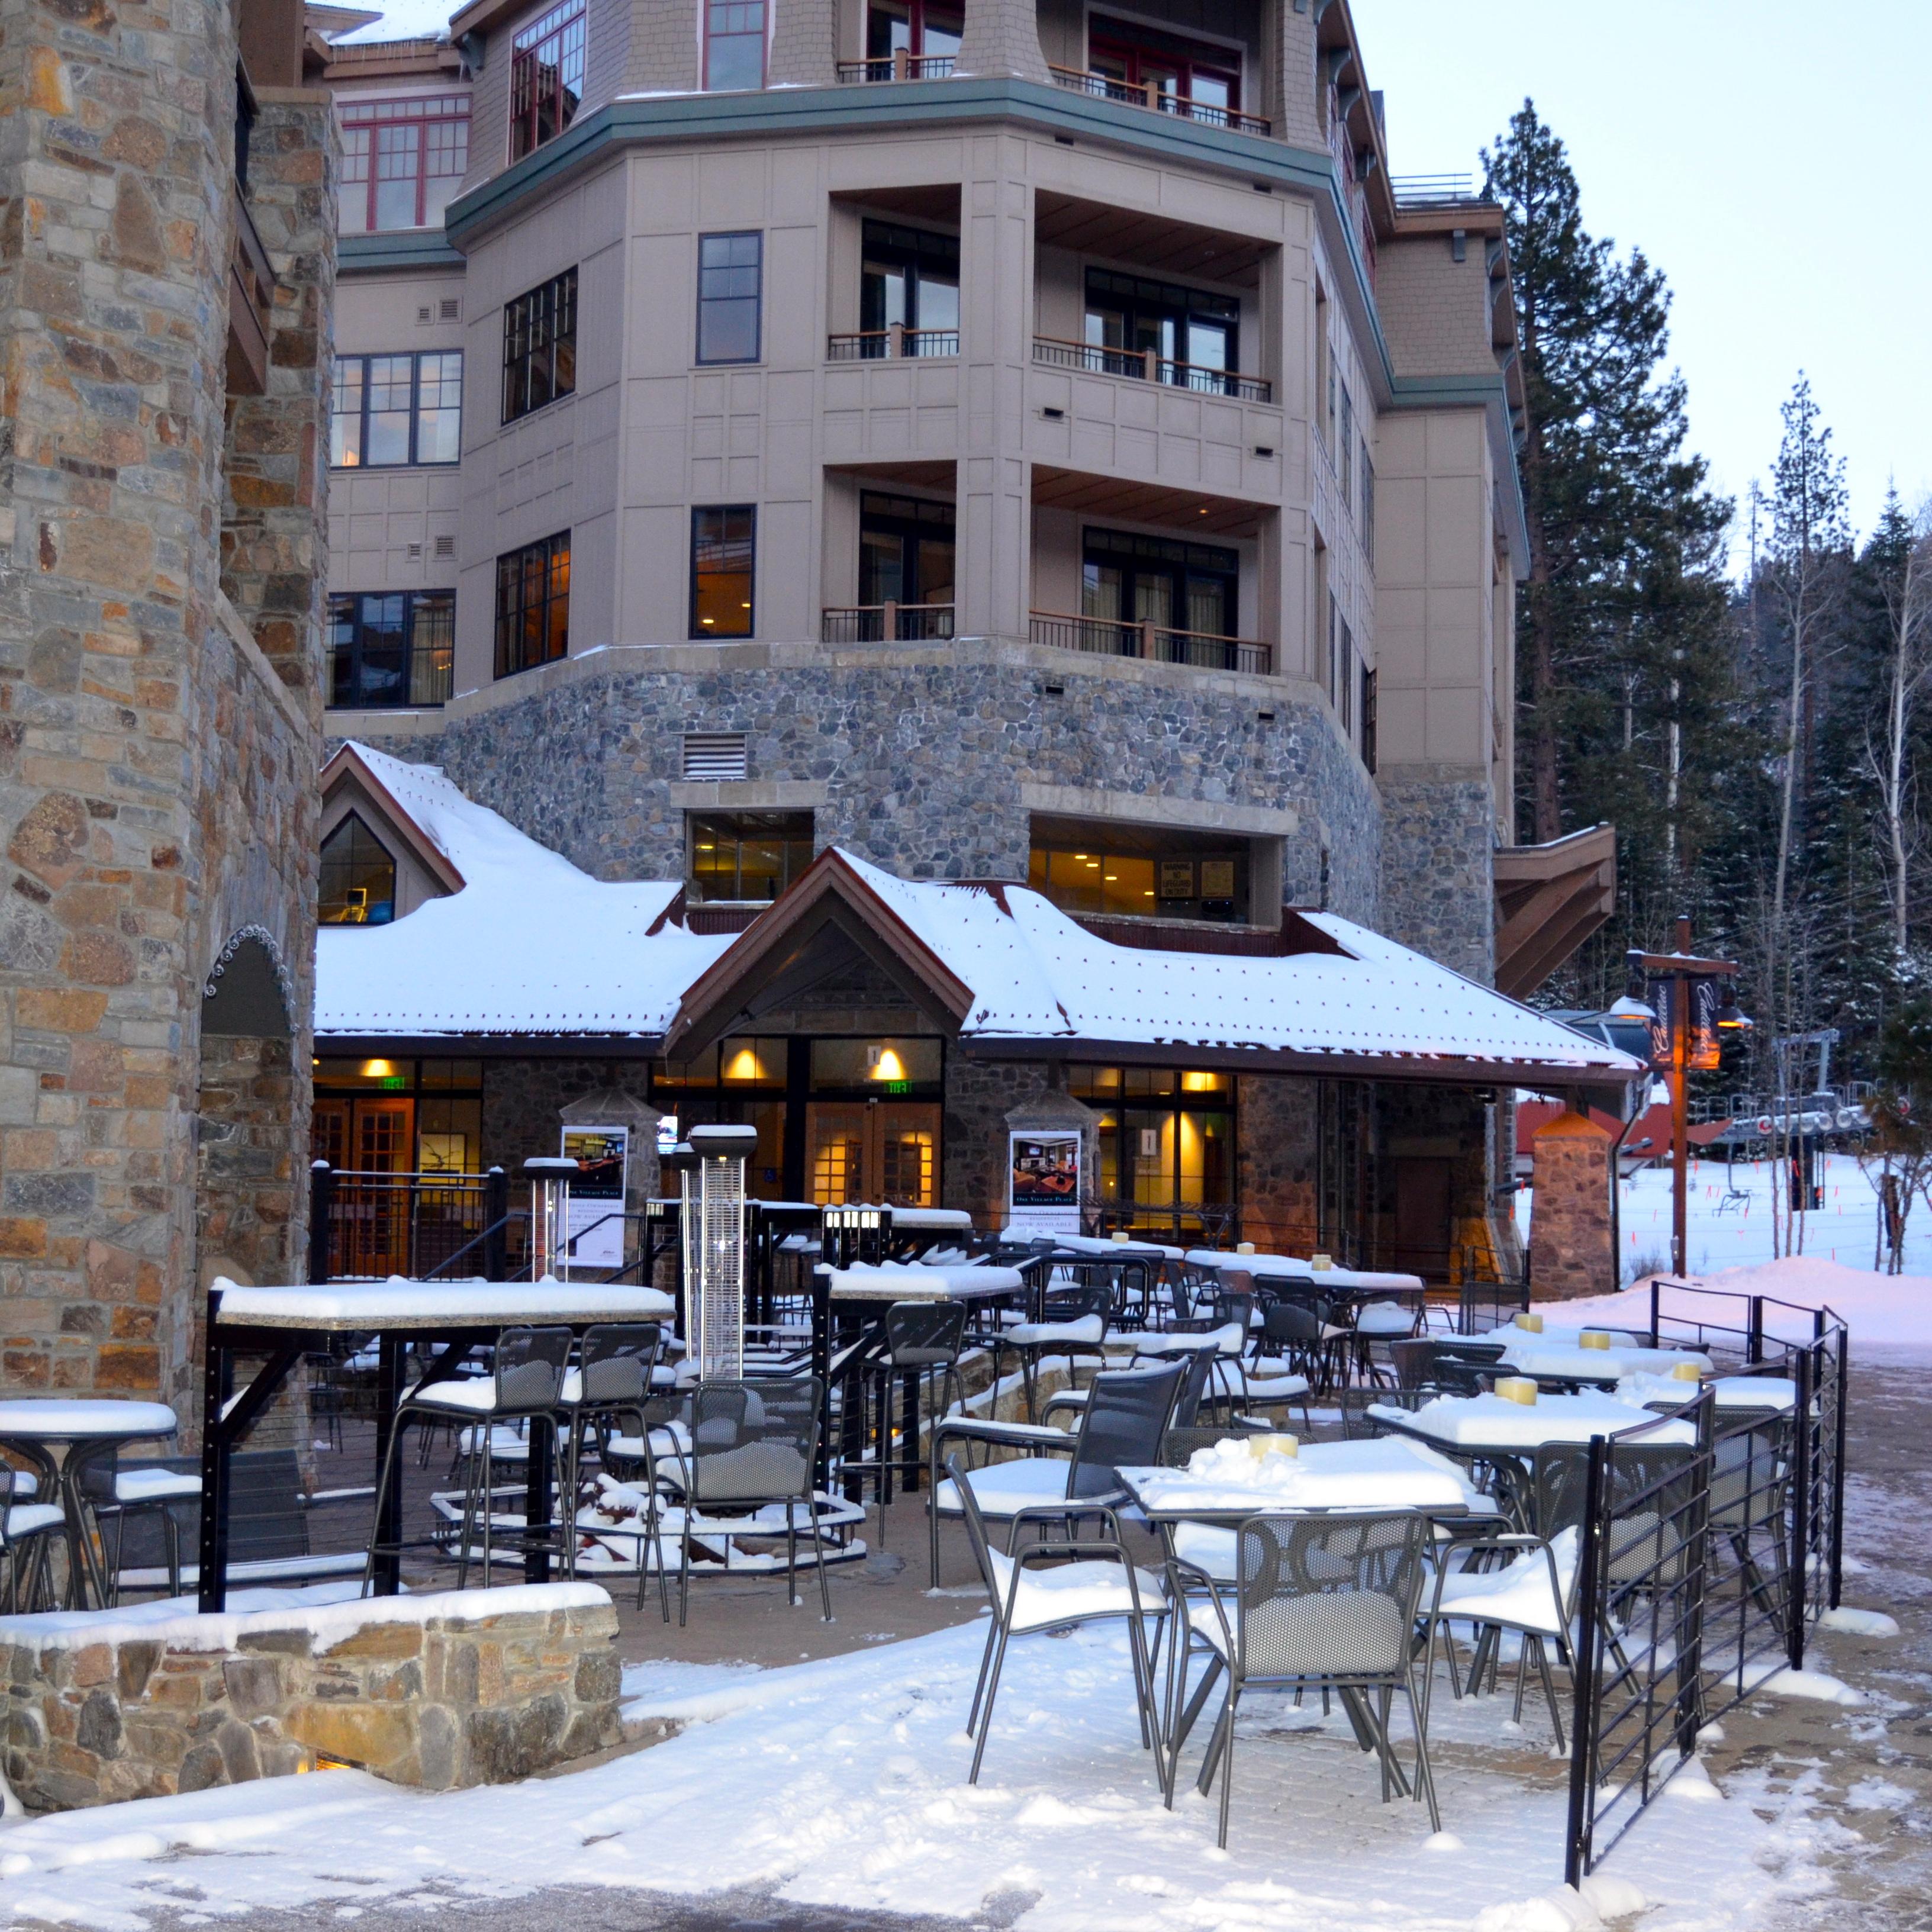 a visit to northstar resort in lake tahoe - after orange county